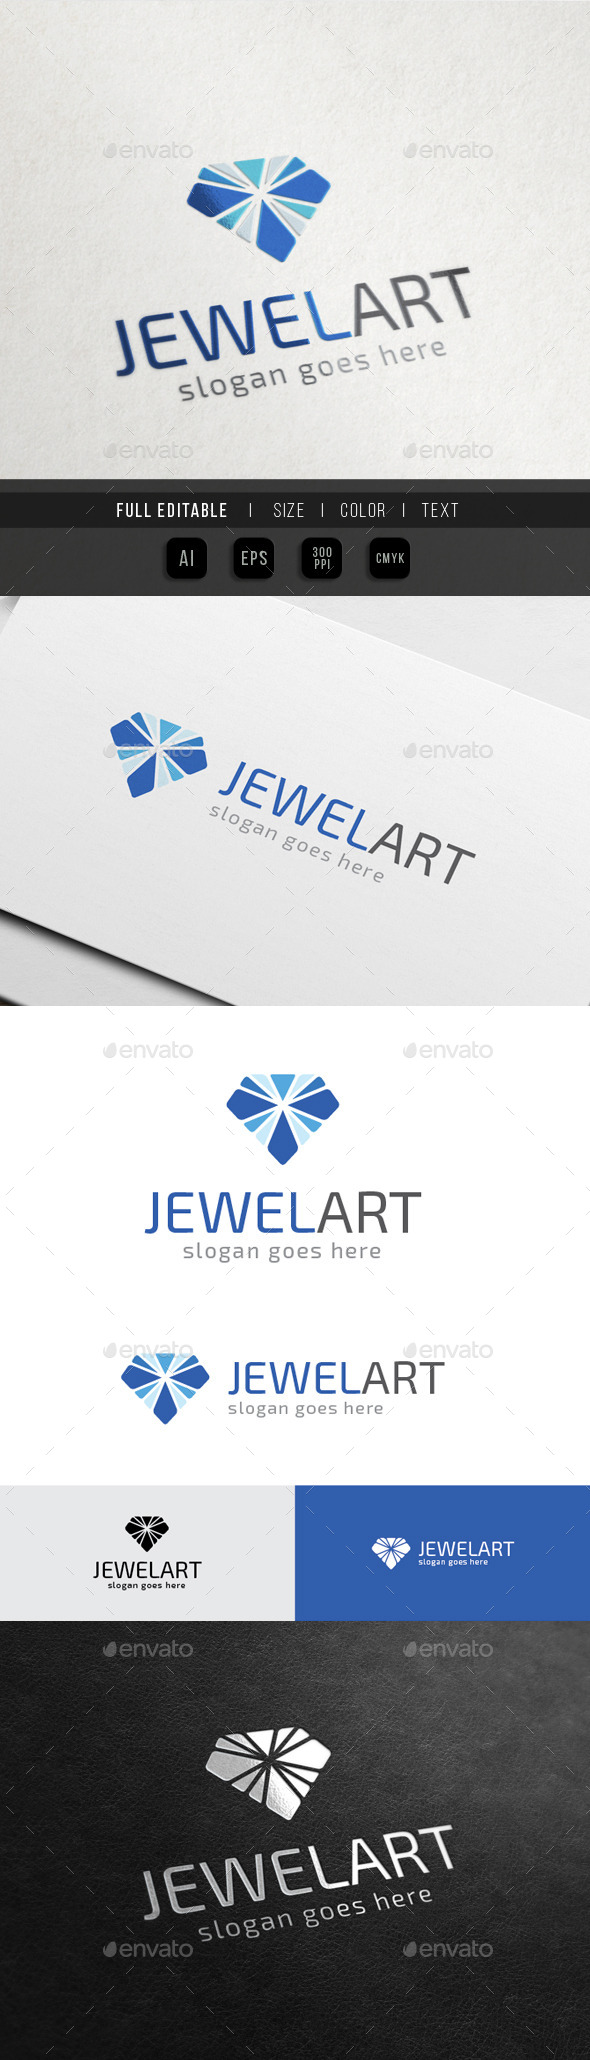 Jewel Art - Diamond Media - Objects Logo Templates